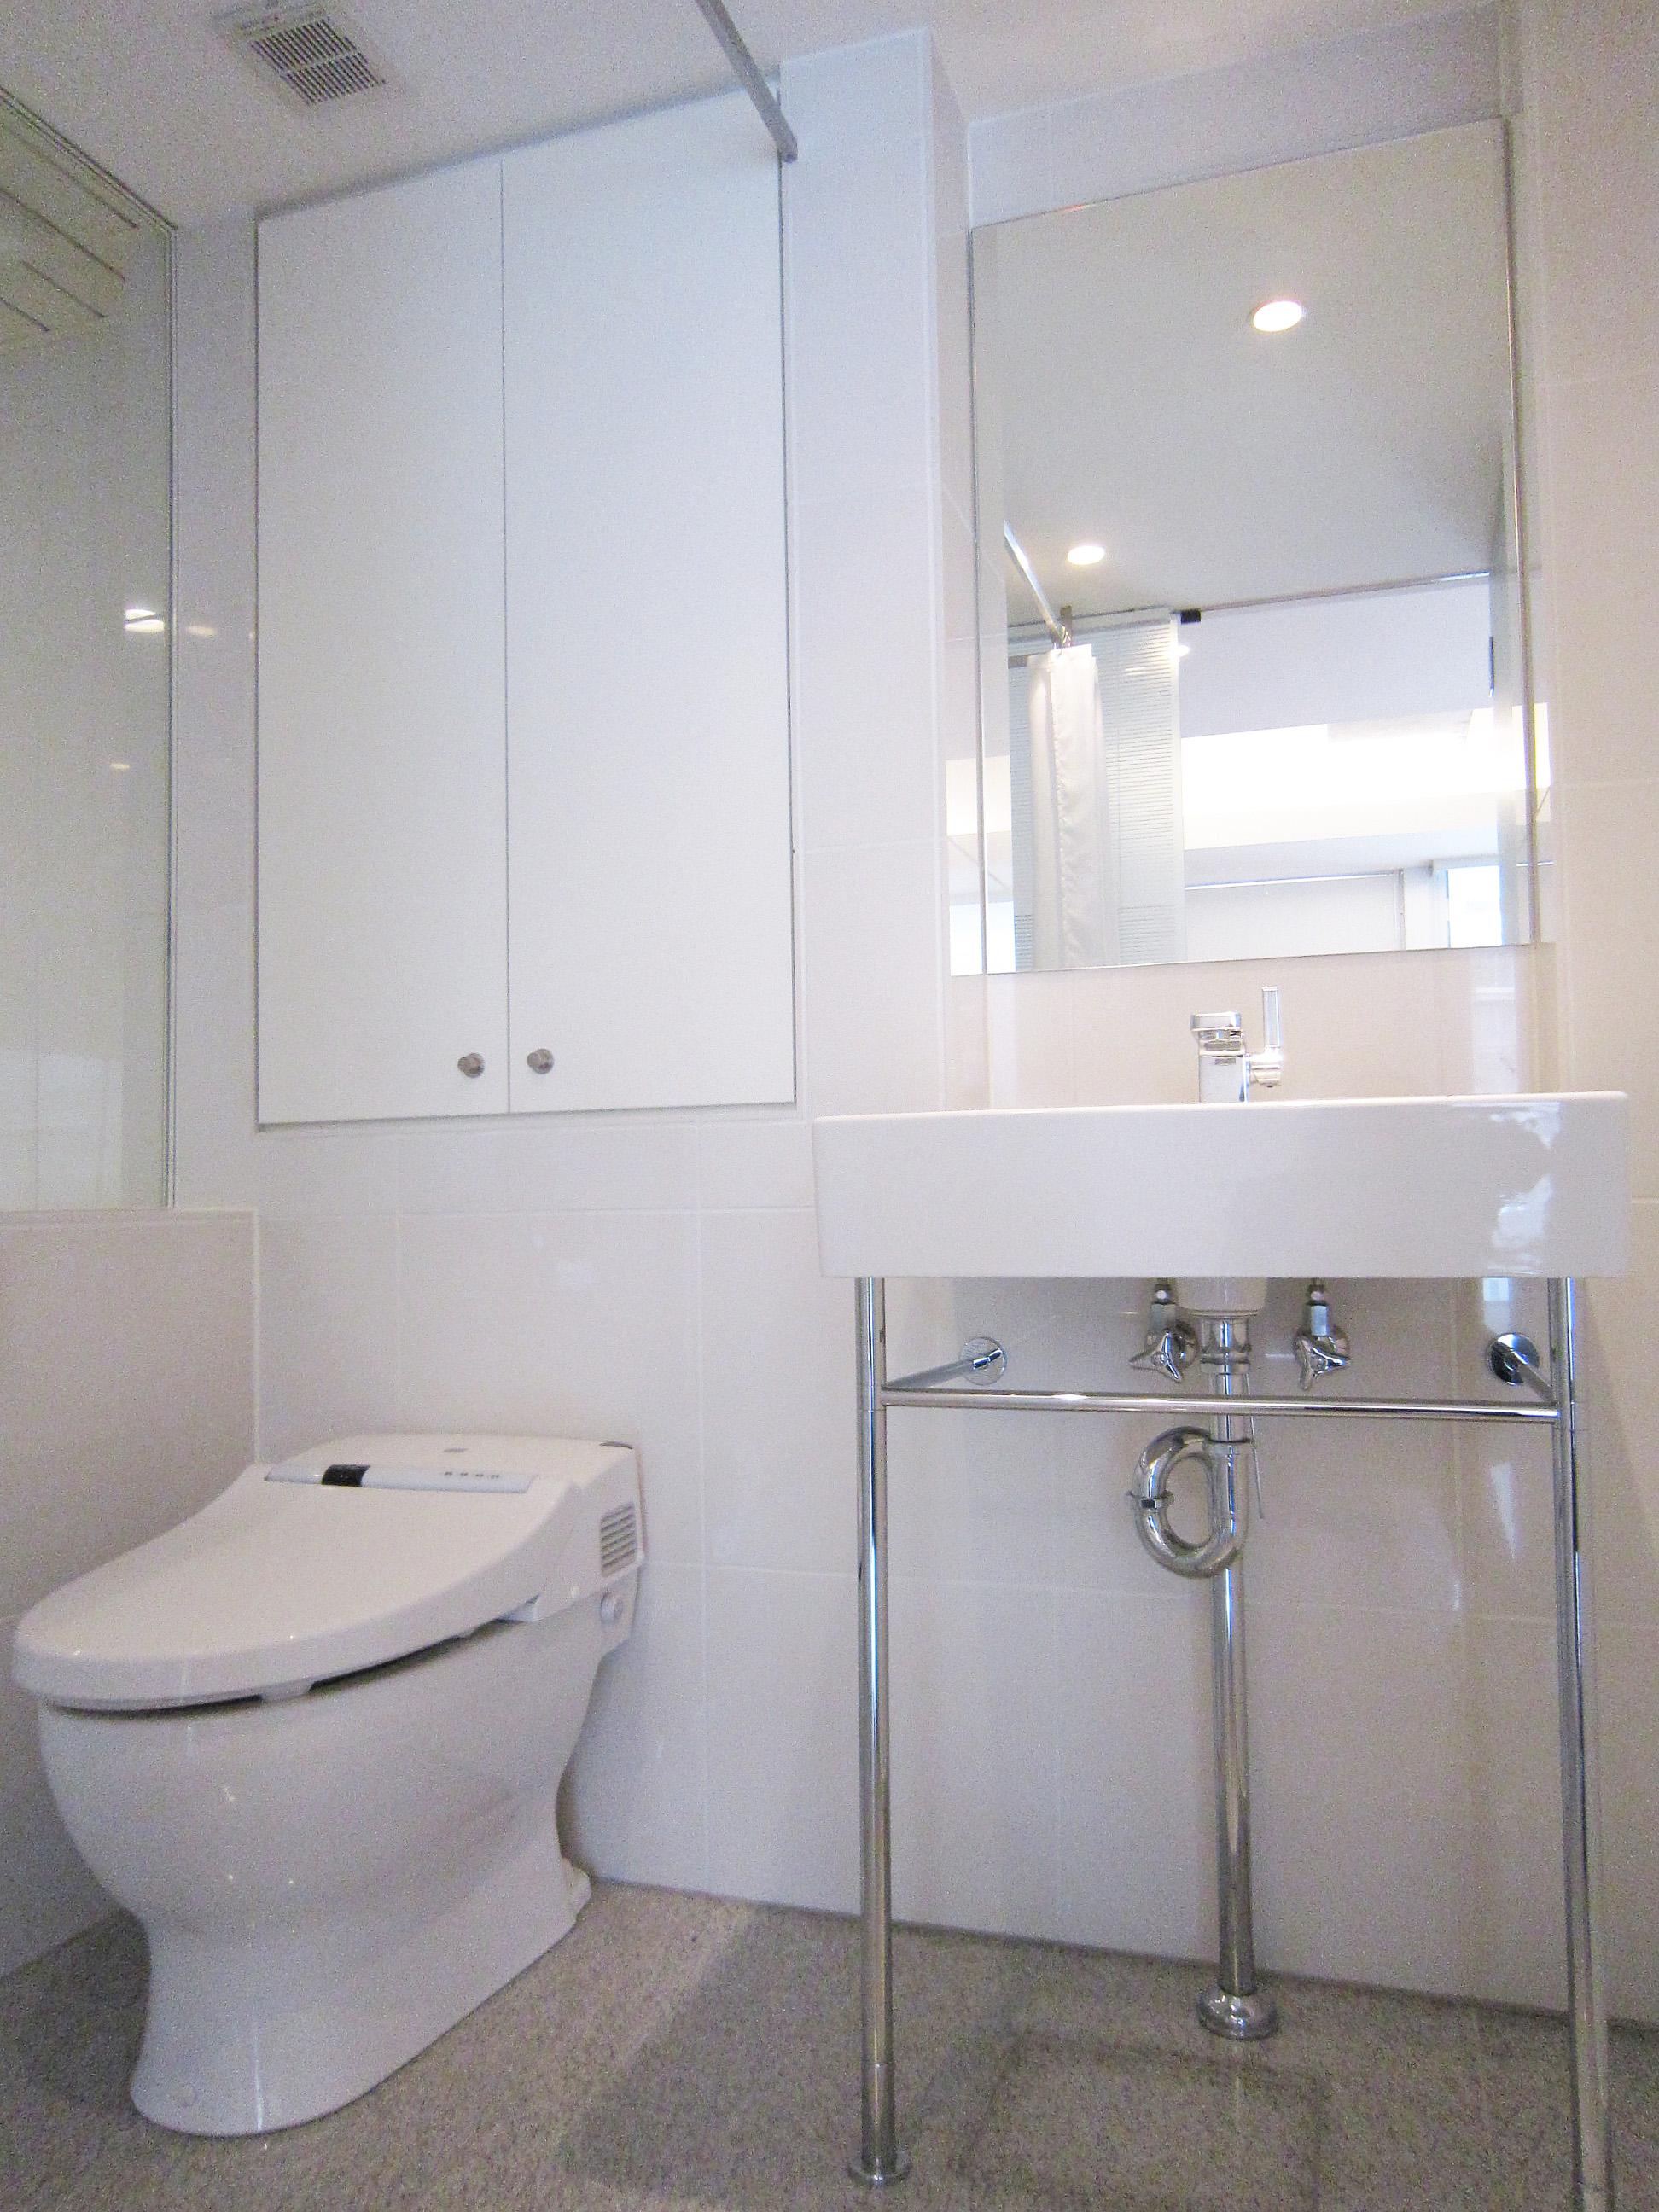 1LDK 55.55㎡タイプ - 洗面室